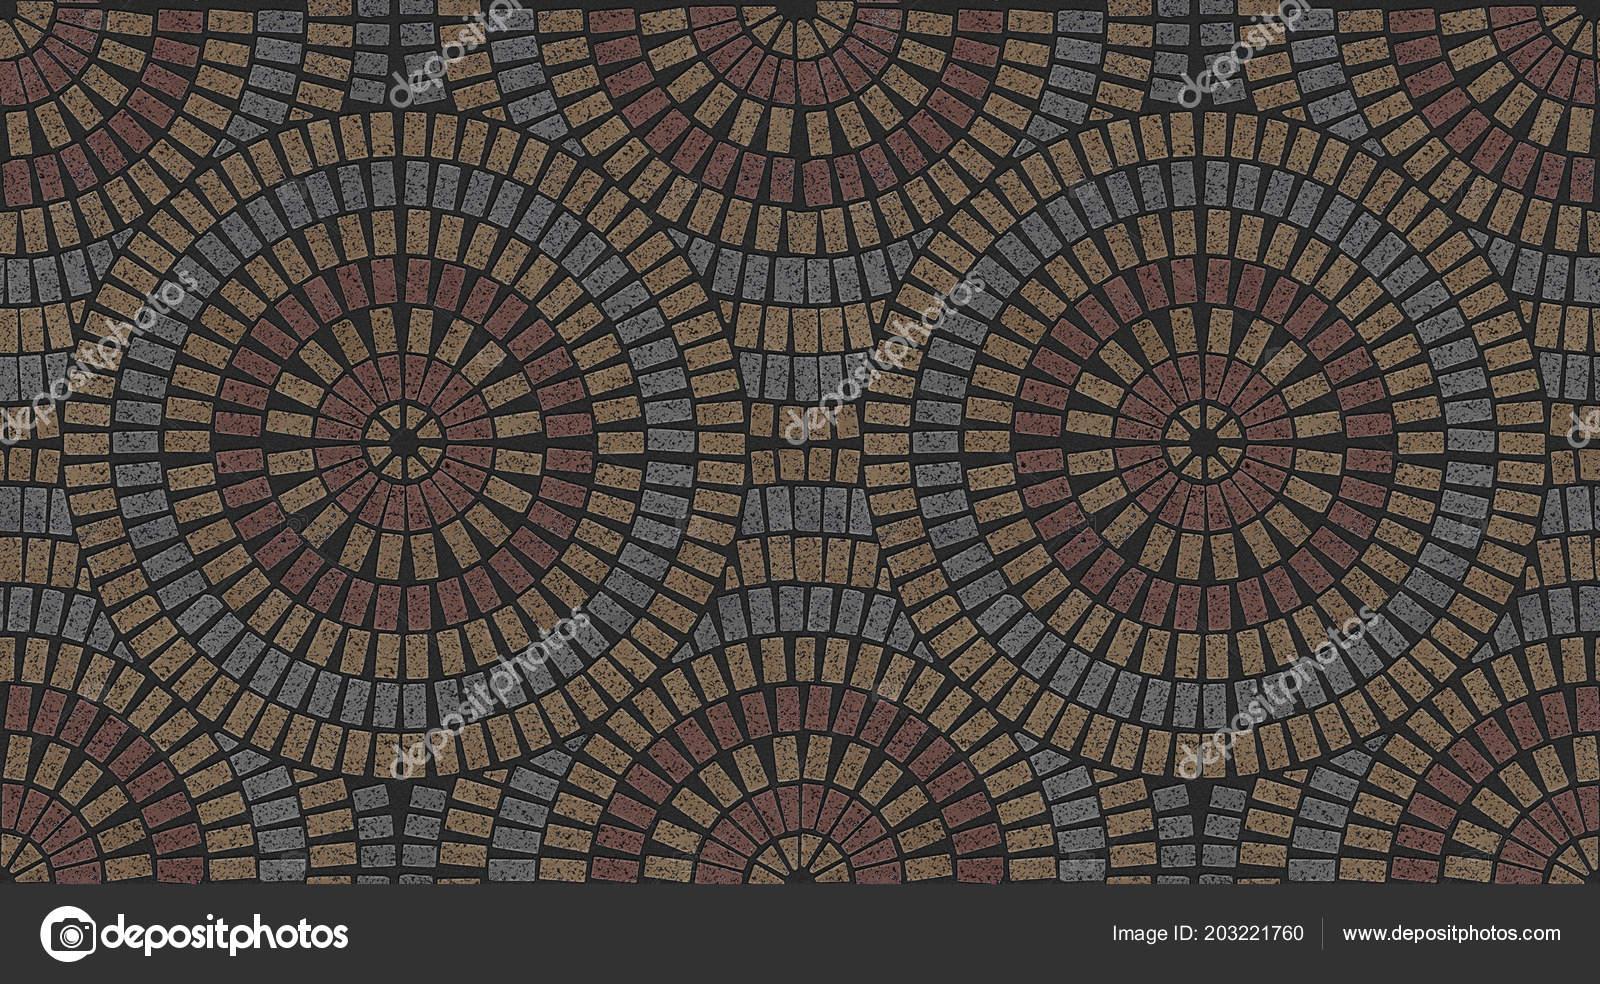 Granite Tile Ornate Paving Stones Seamless Variegated Texture Stock Photo C Threedicube 203221760